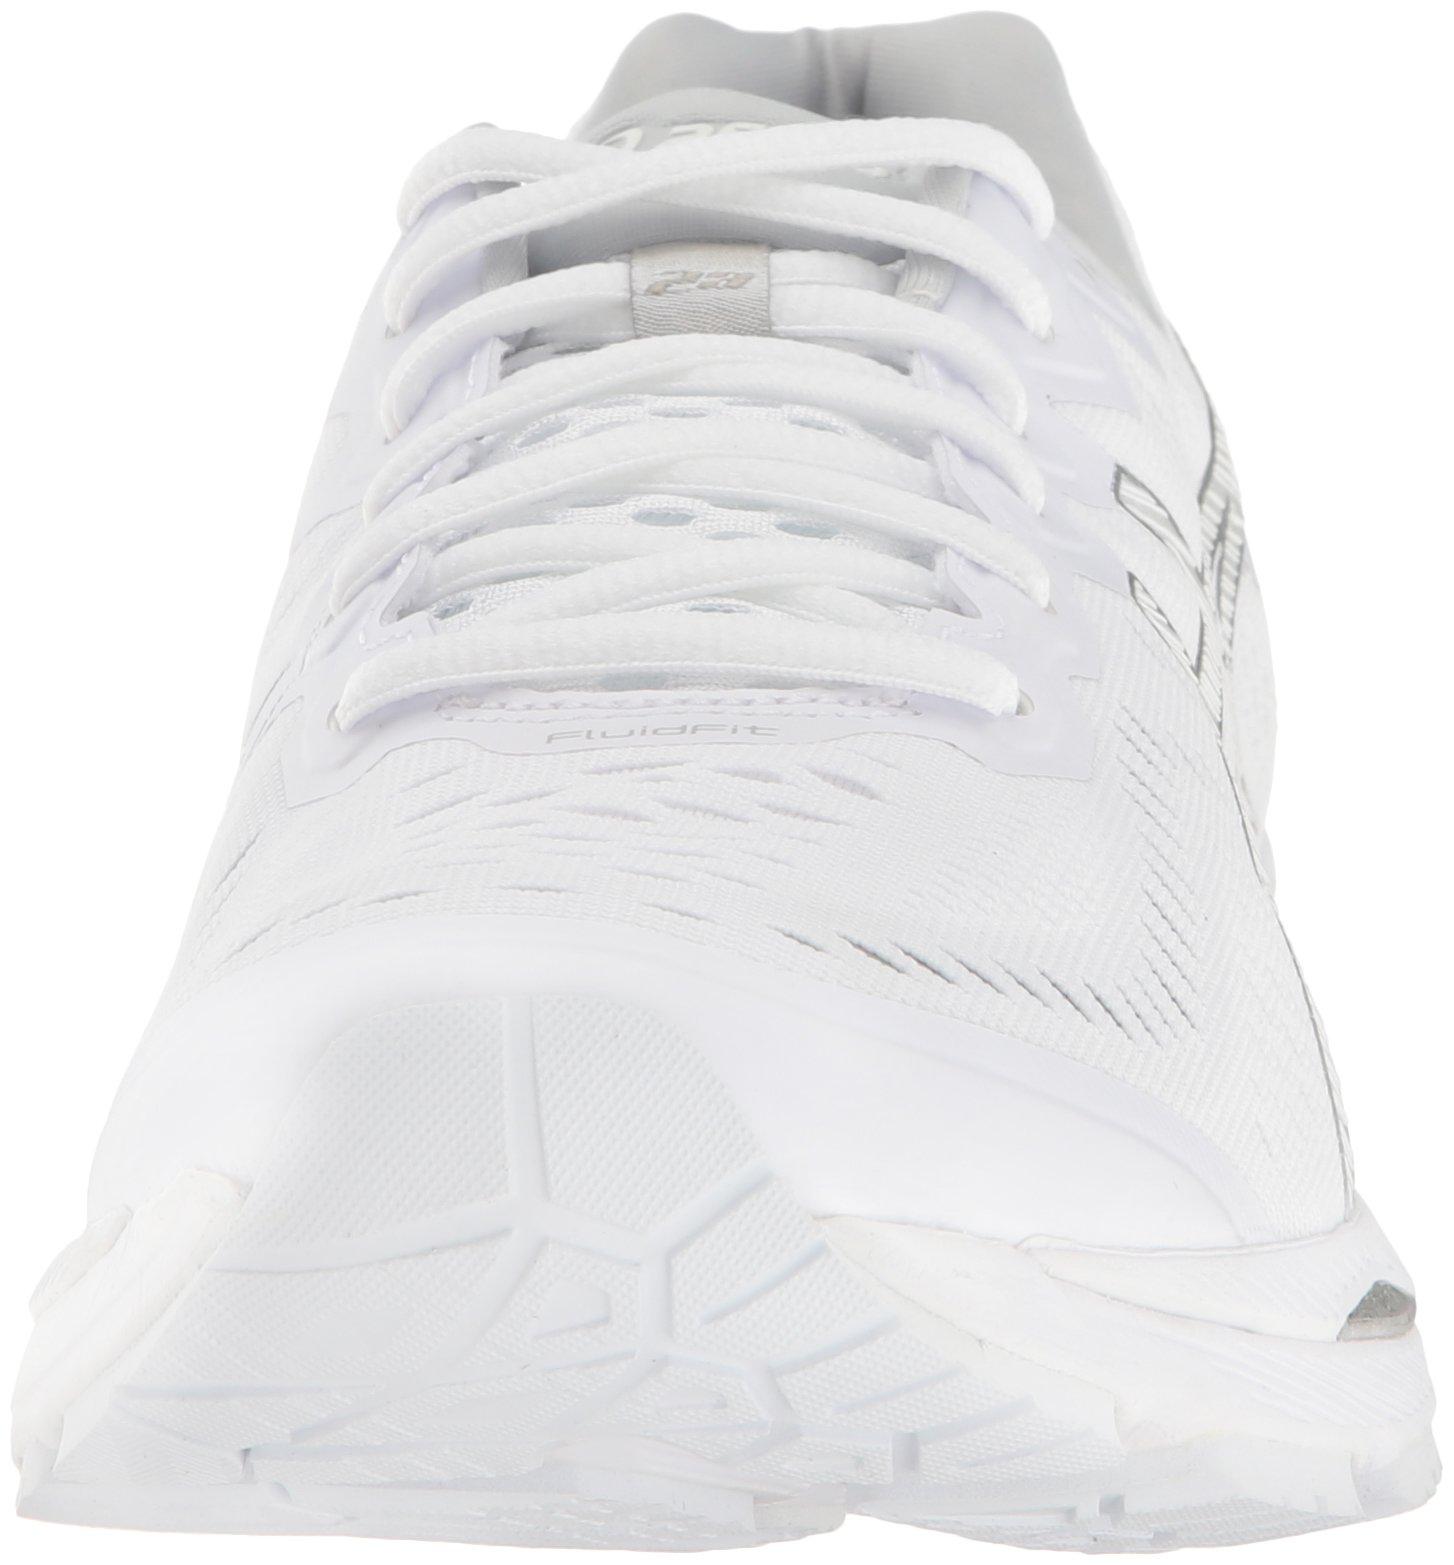 71%2BfxiDKbTL - ASICS Men's Gel-Kayano 23 Running Shoe